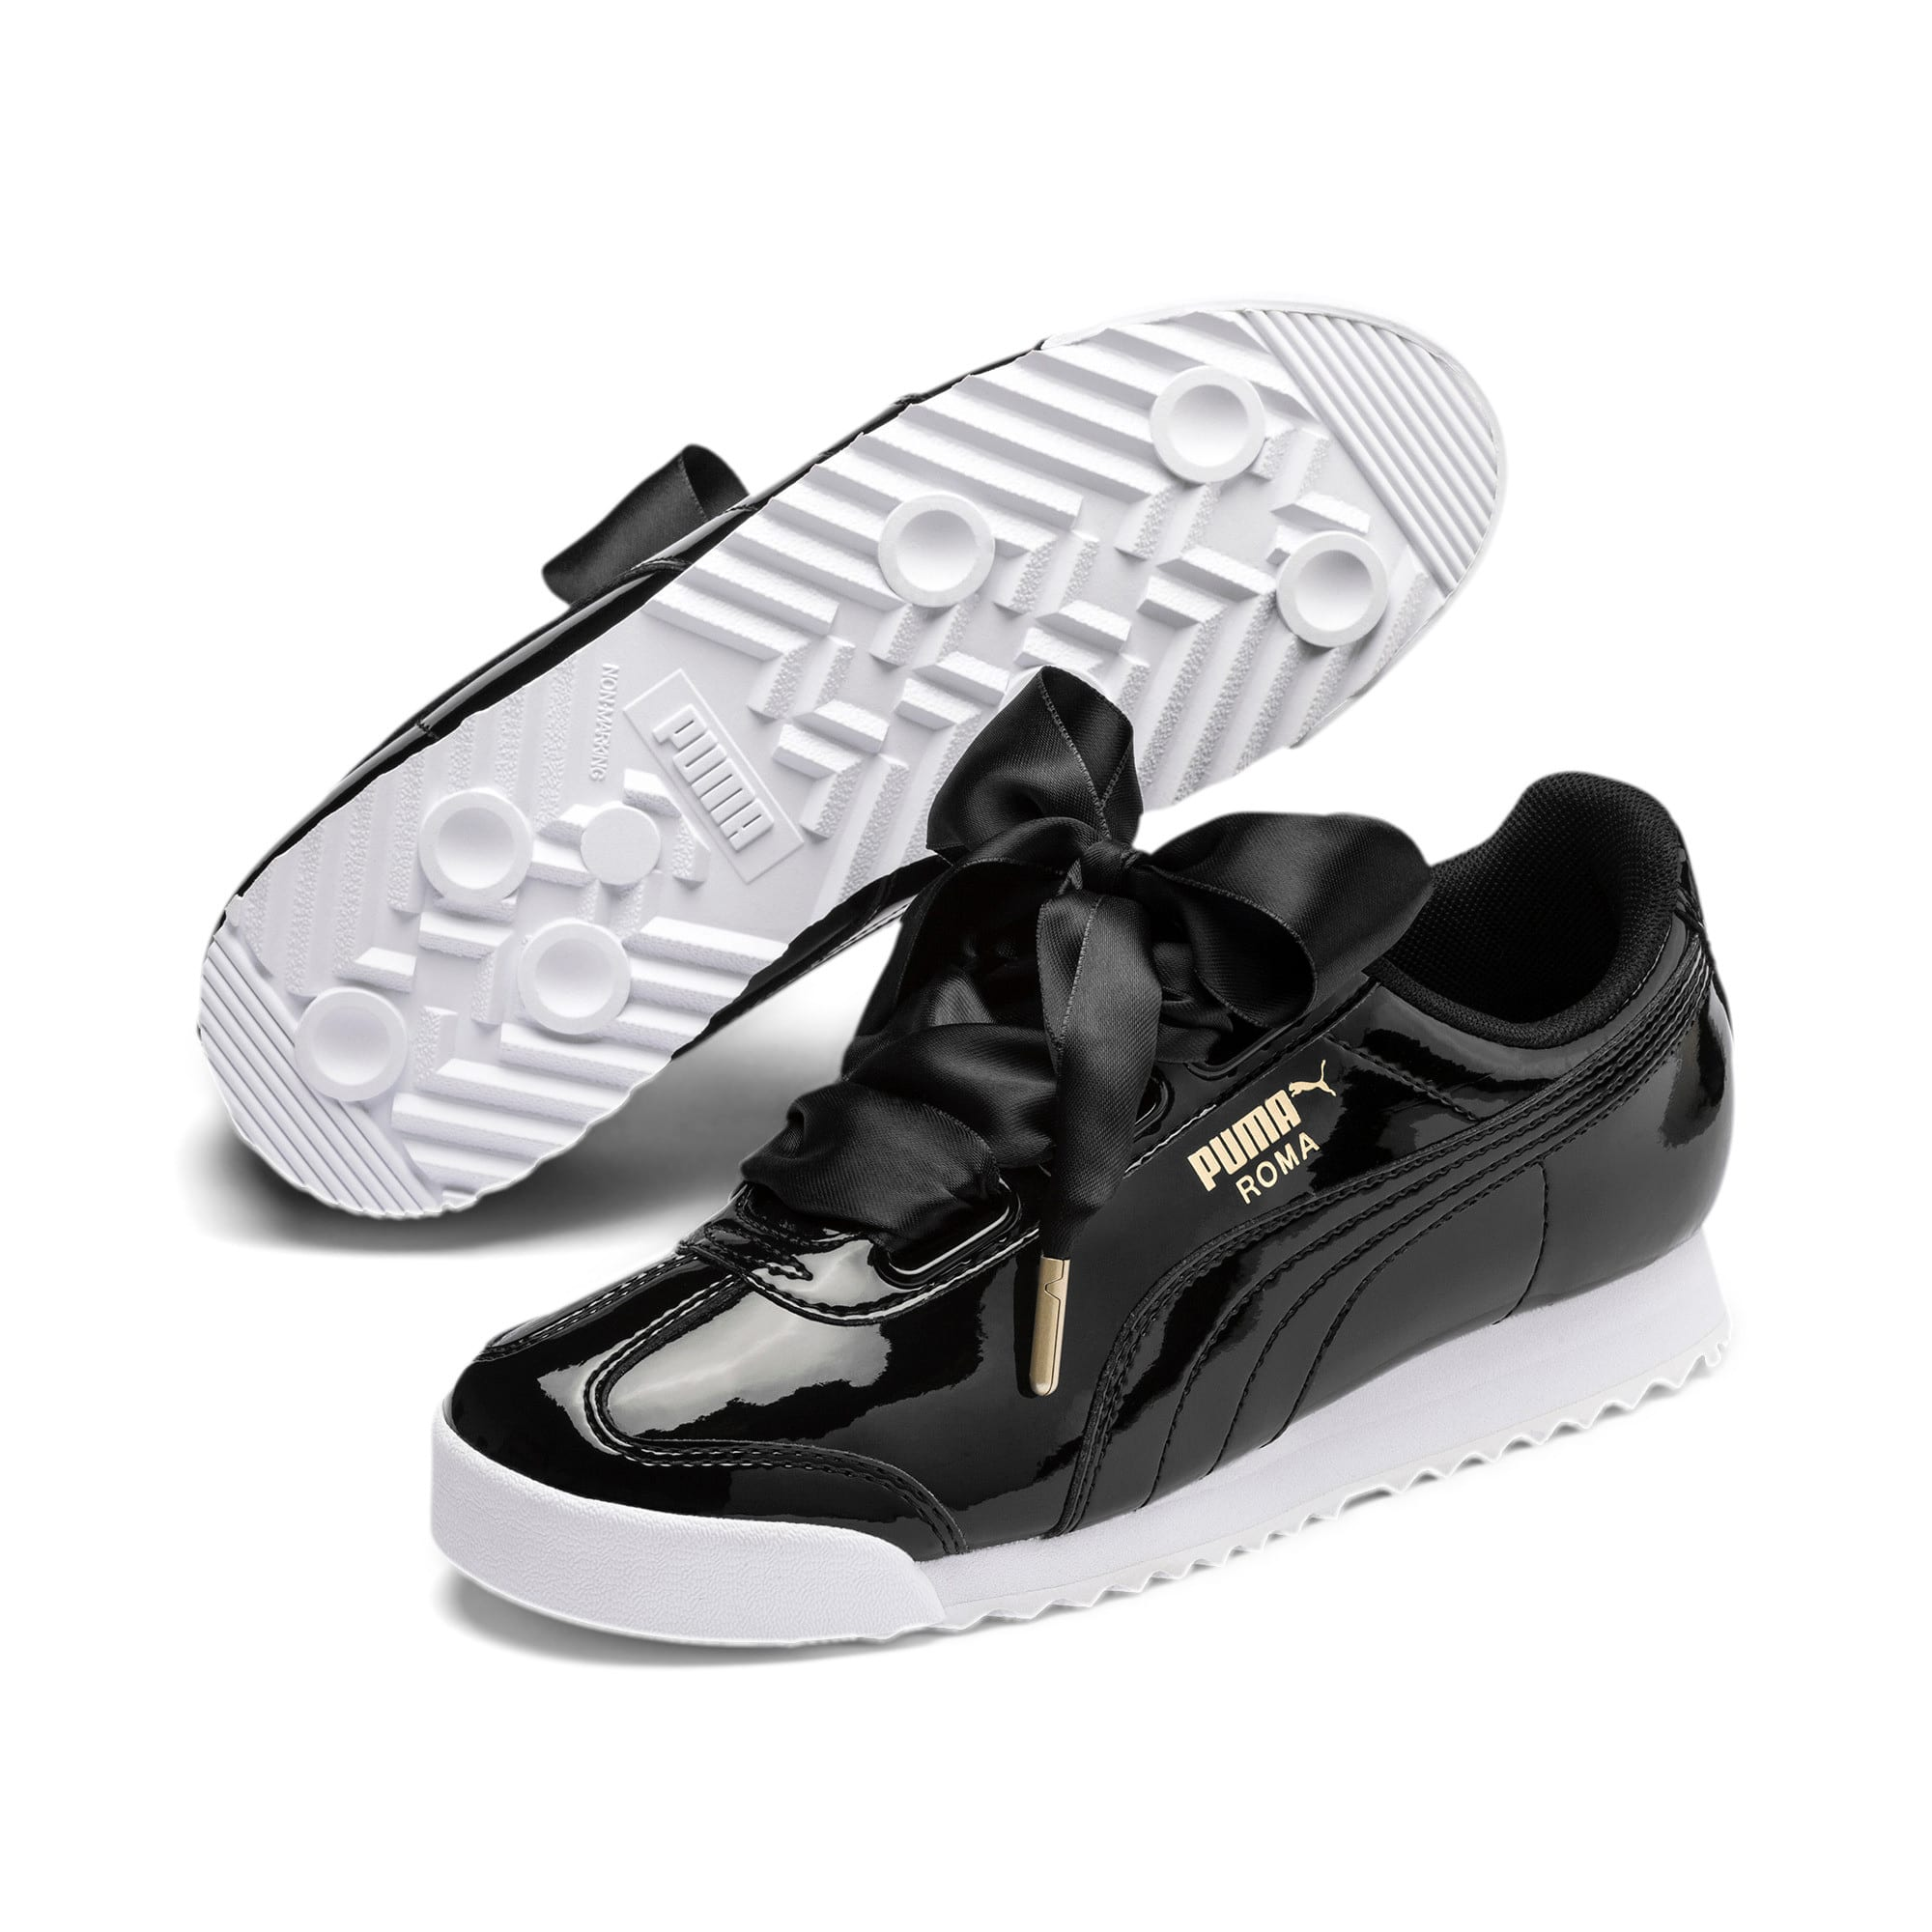 Thumbnail 2 of Roma Heart Patent Women's Sneakers, Puma Black-Puma Team Gold, medium